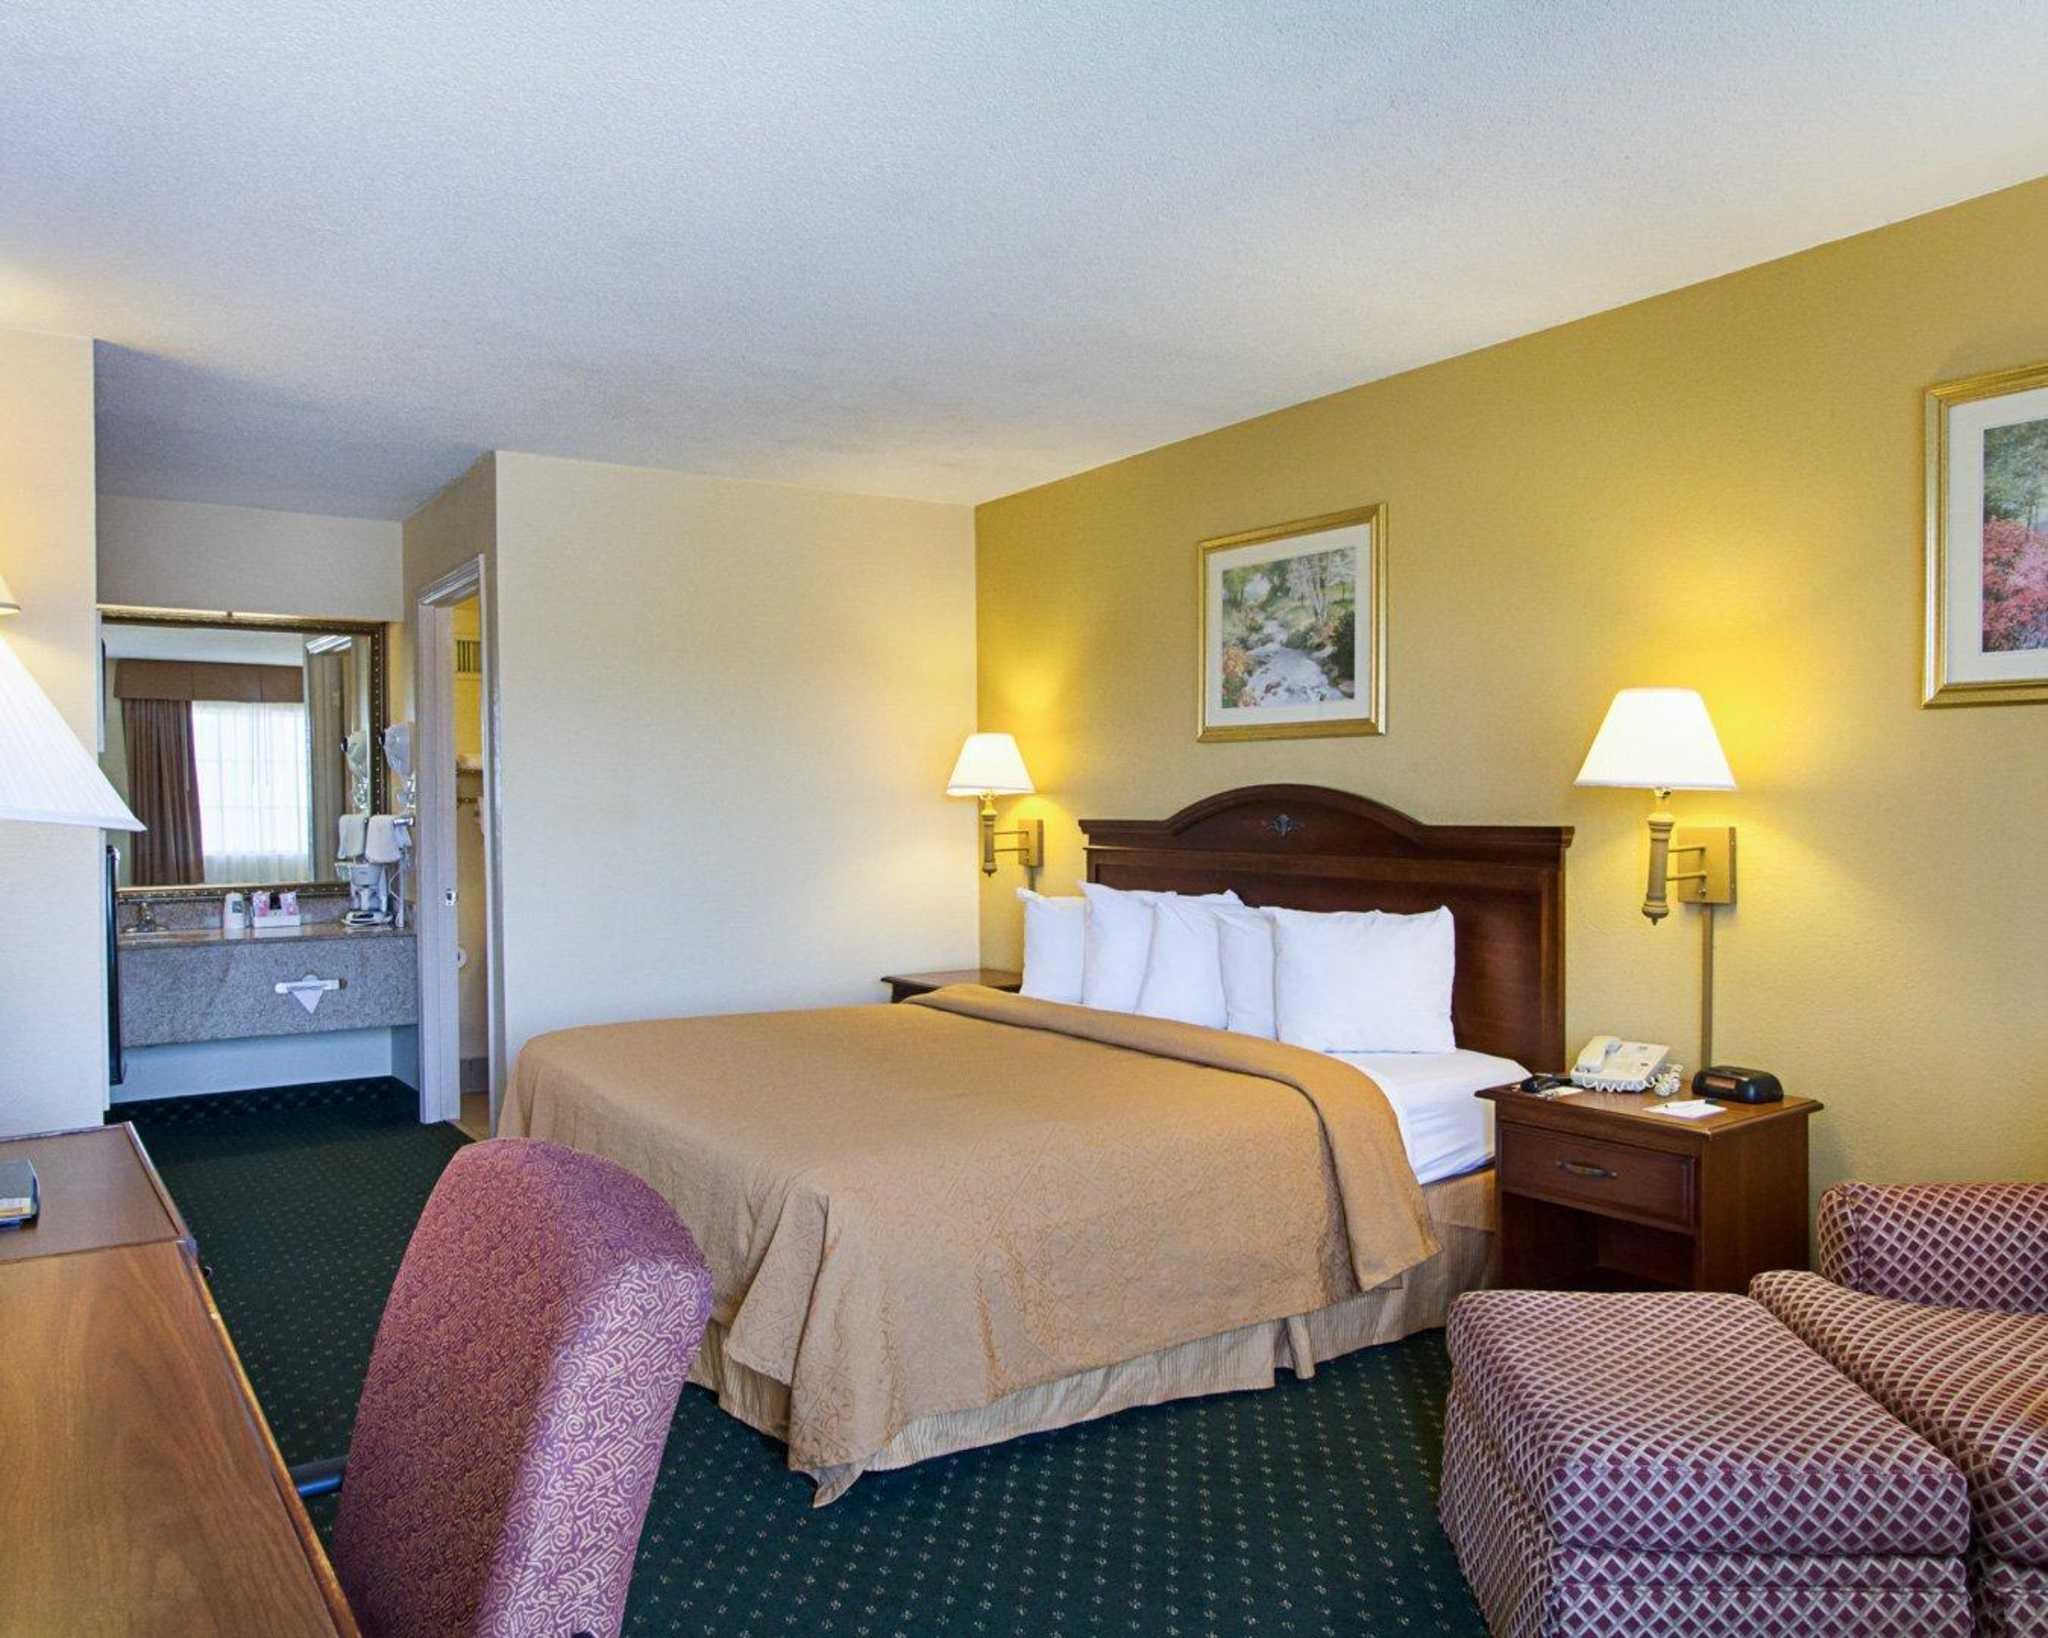 Quality Inn & Suites Southwest image 3